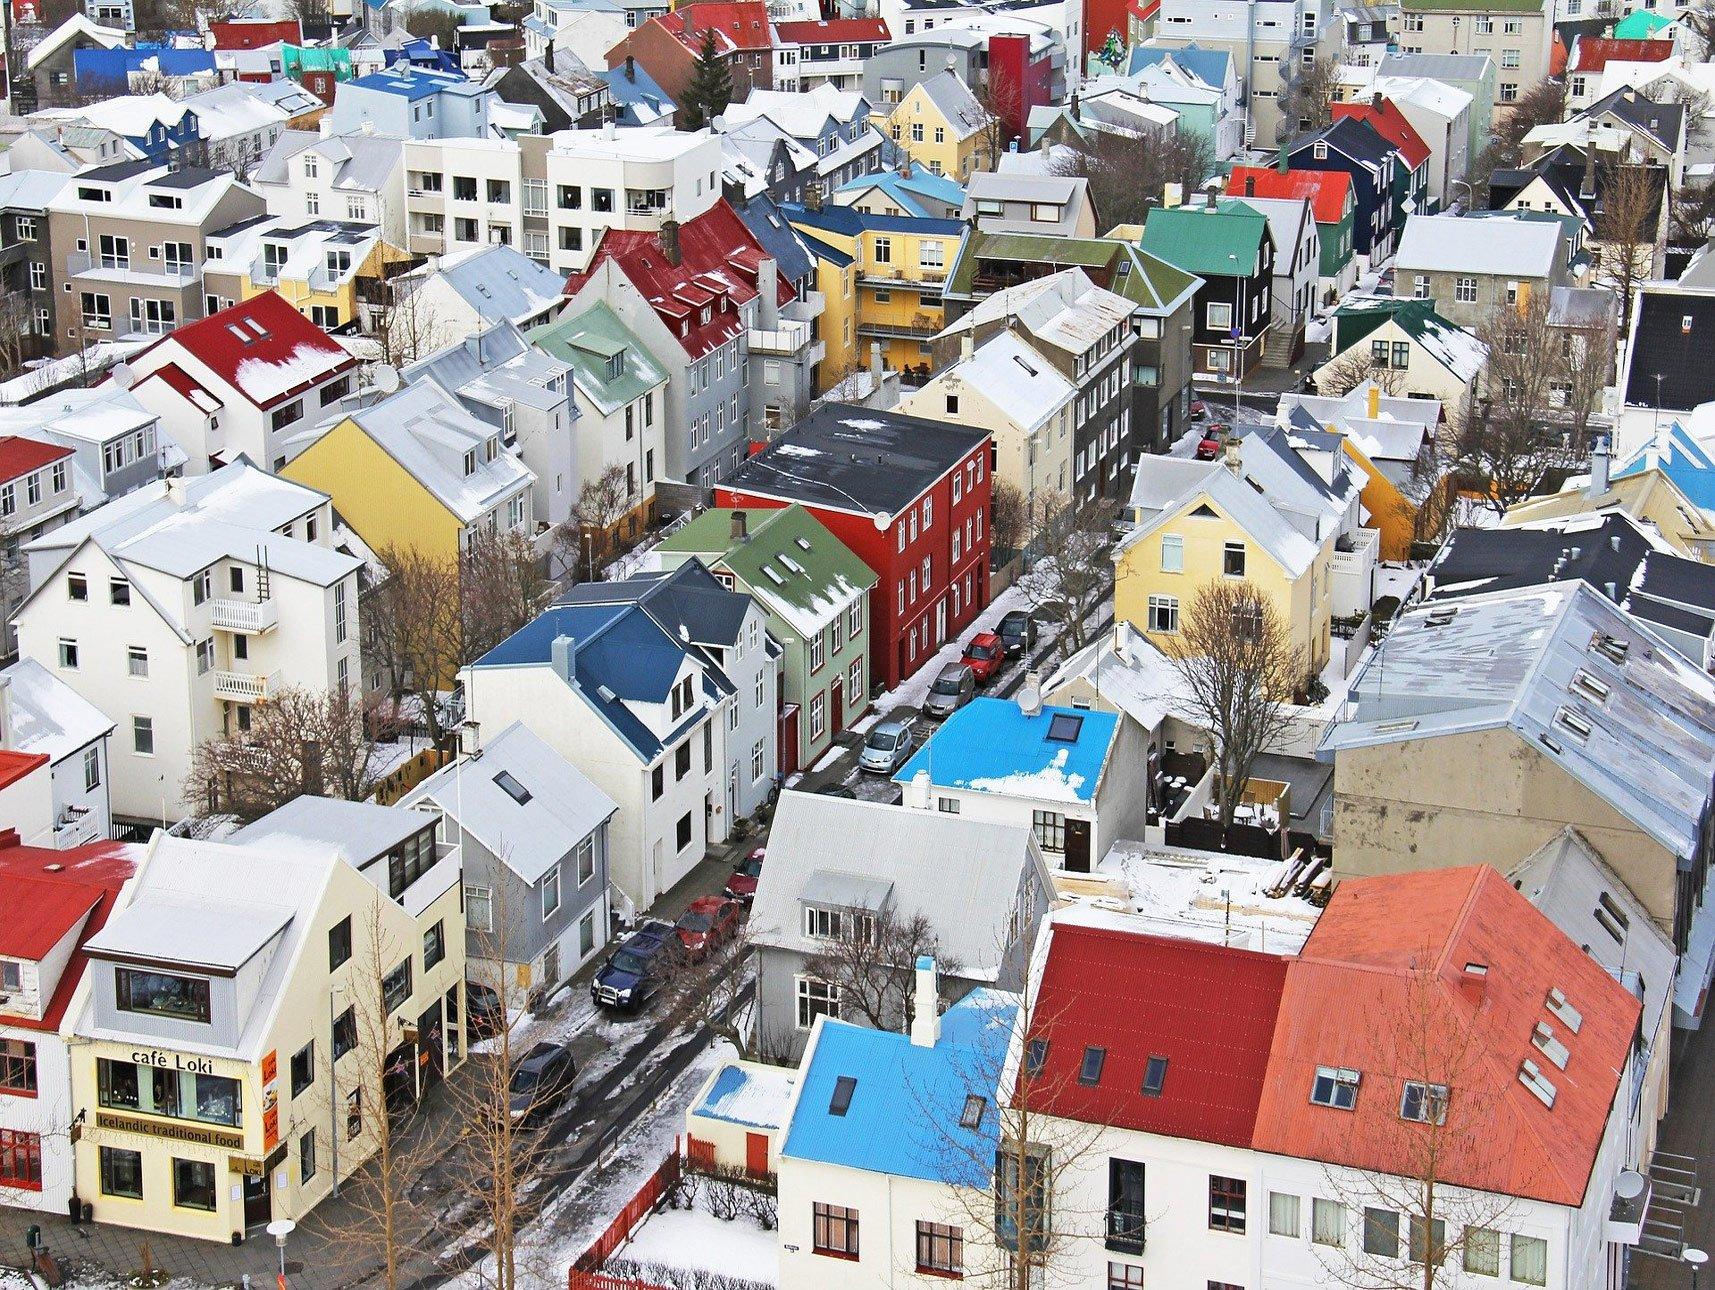 Reykjavik_1715x1290_Web